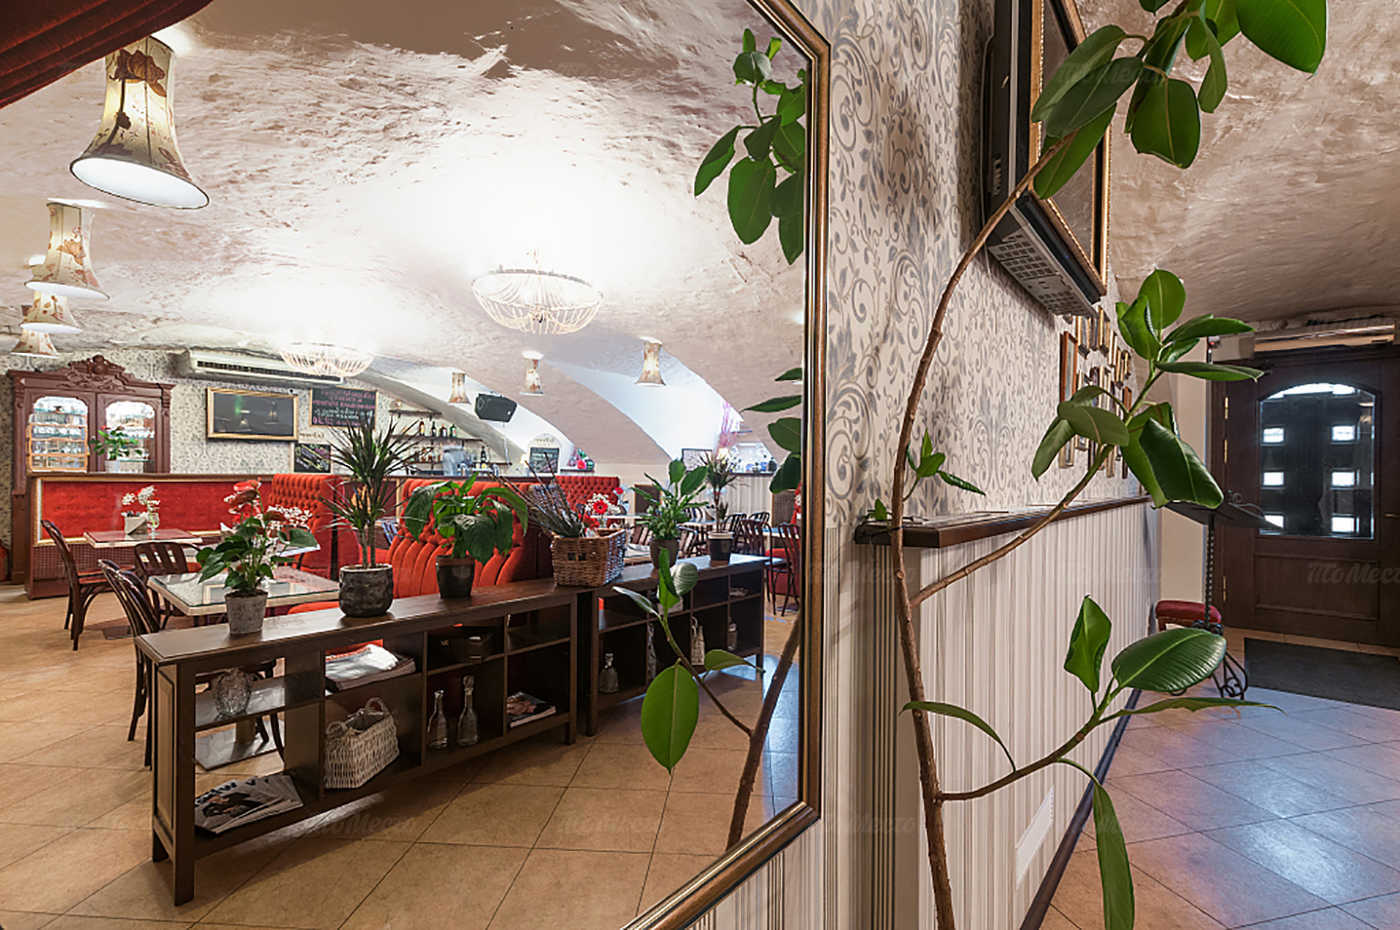 Кафе Распутин на набережной реки Мойки фото 3